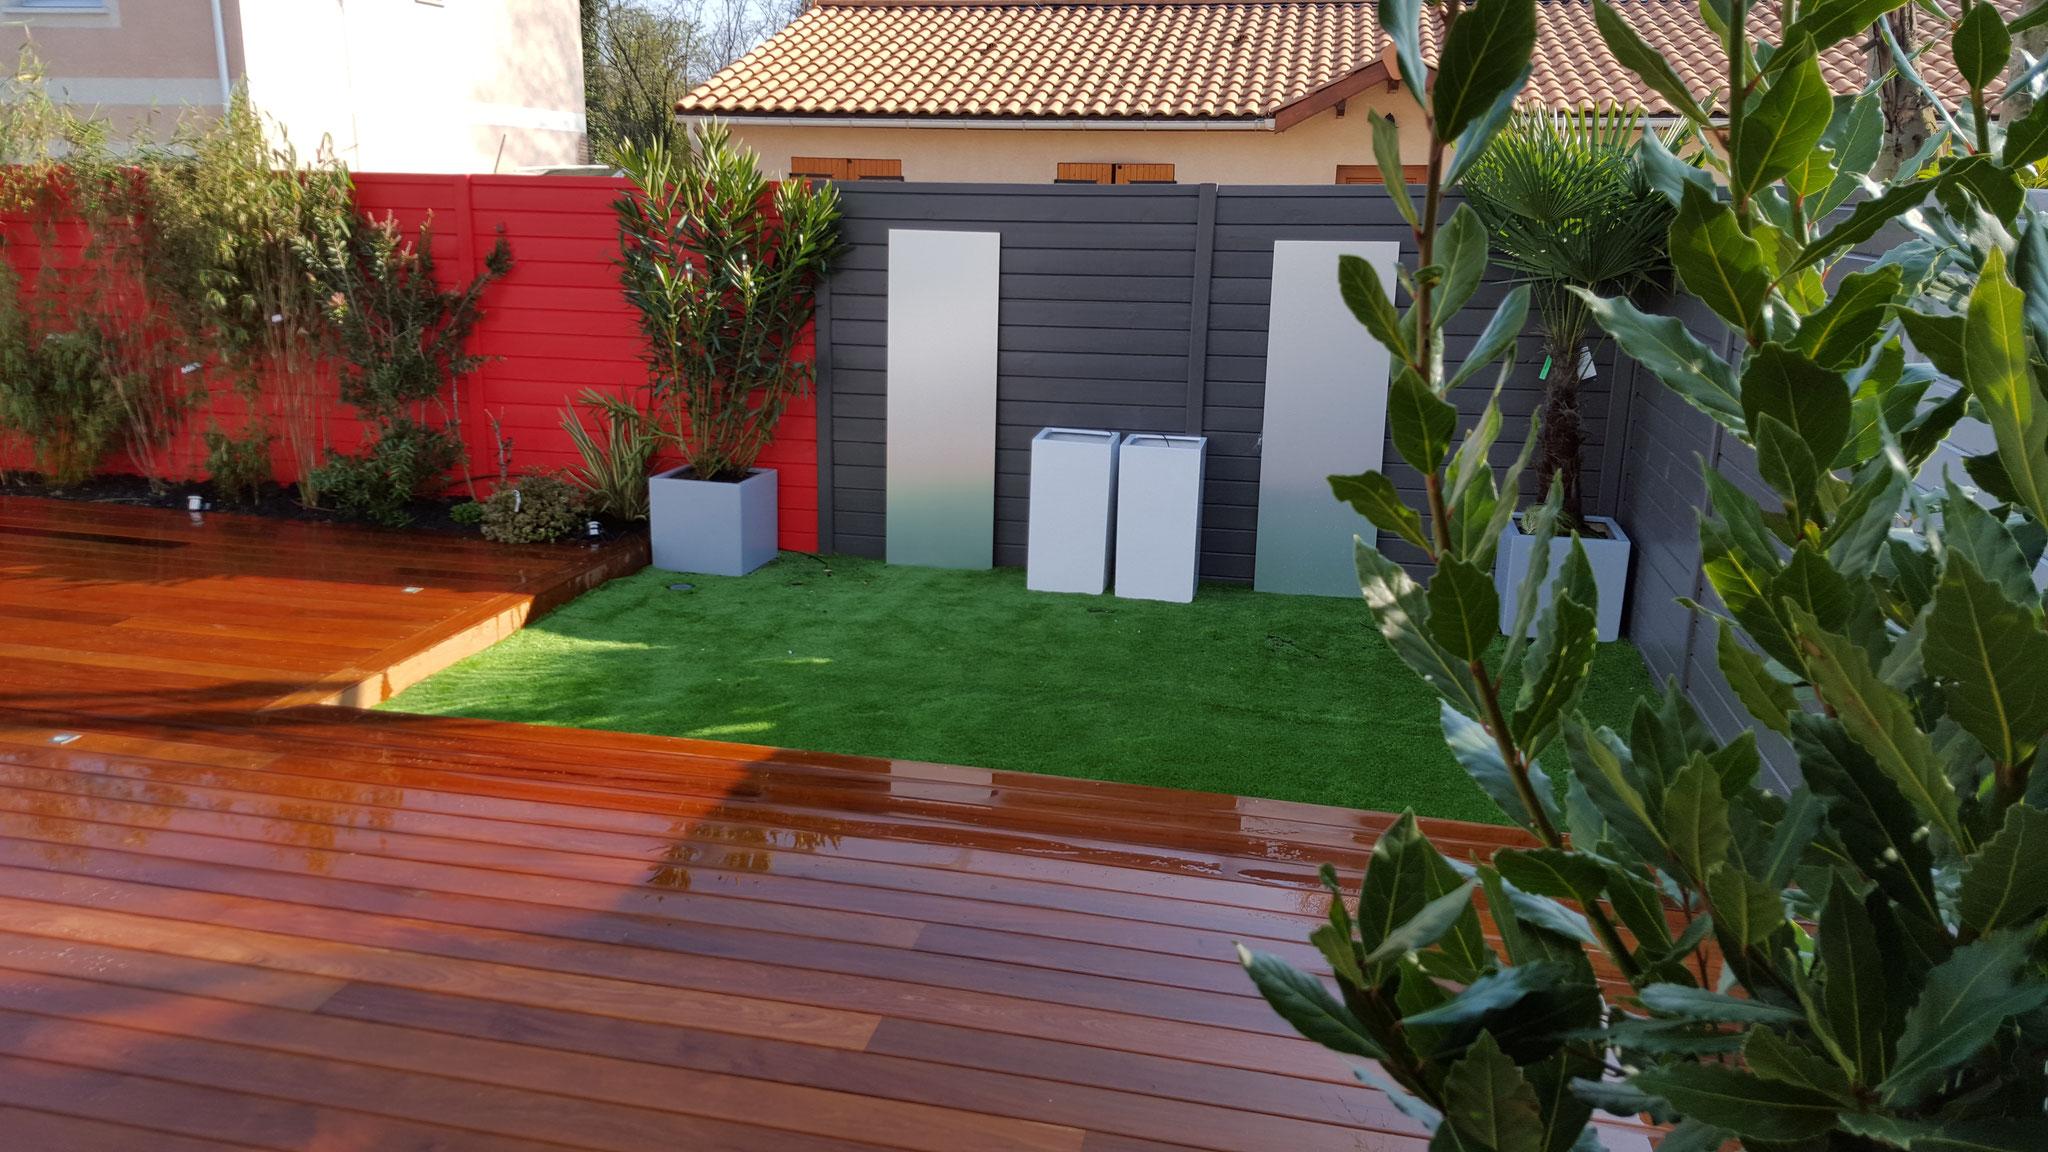 jardin urbain paysagiste jardin de ville balcon terrasse On jardin urbain paysagiste